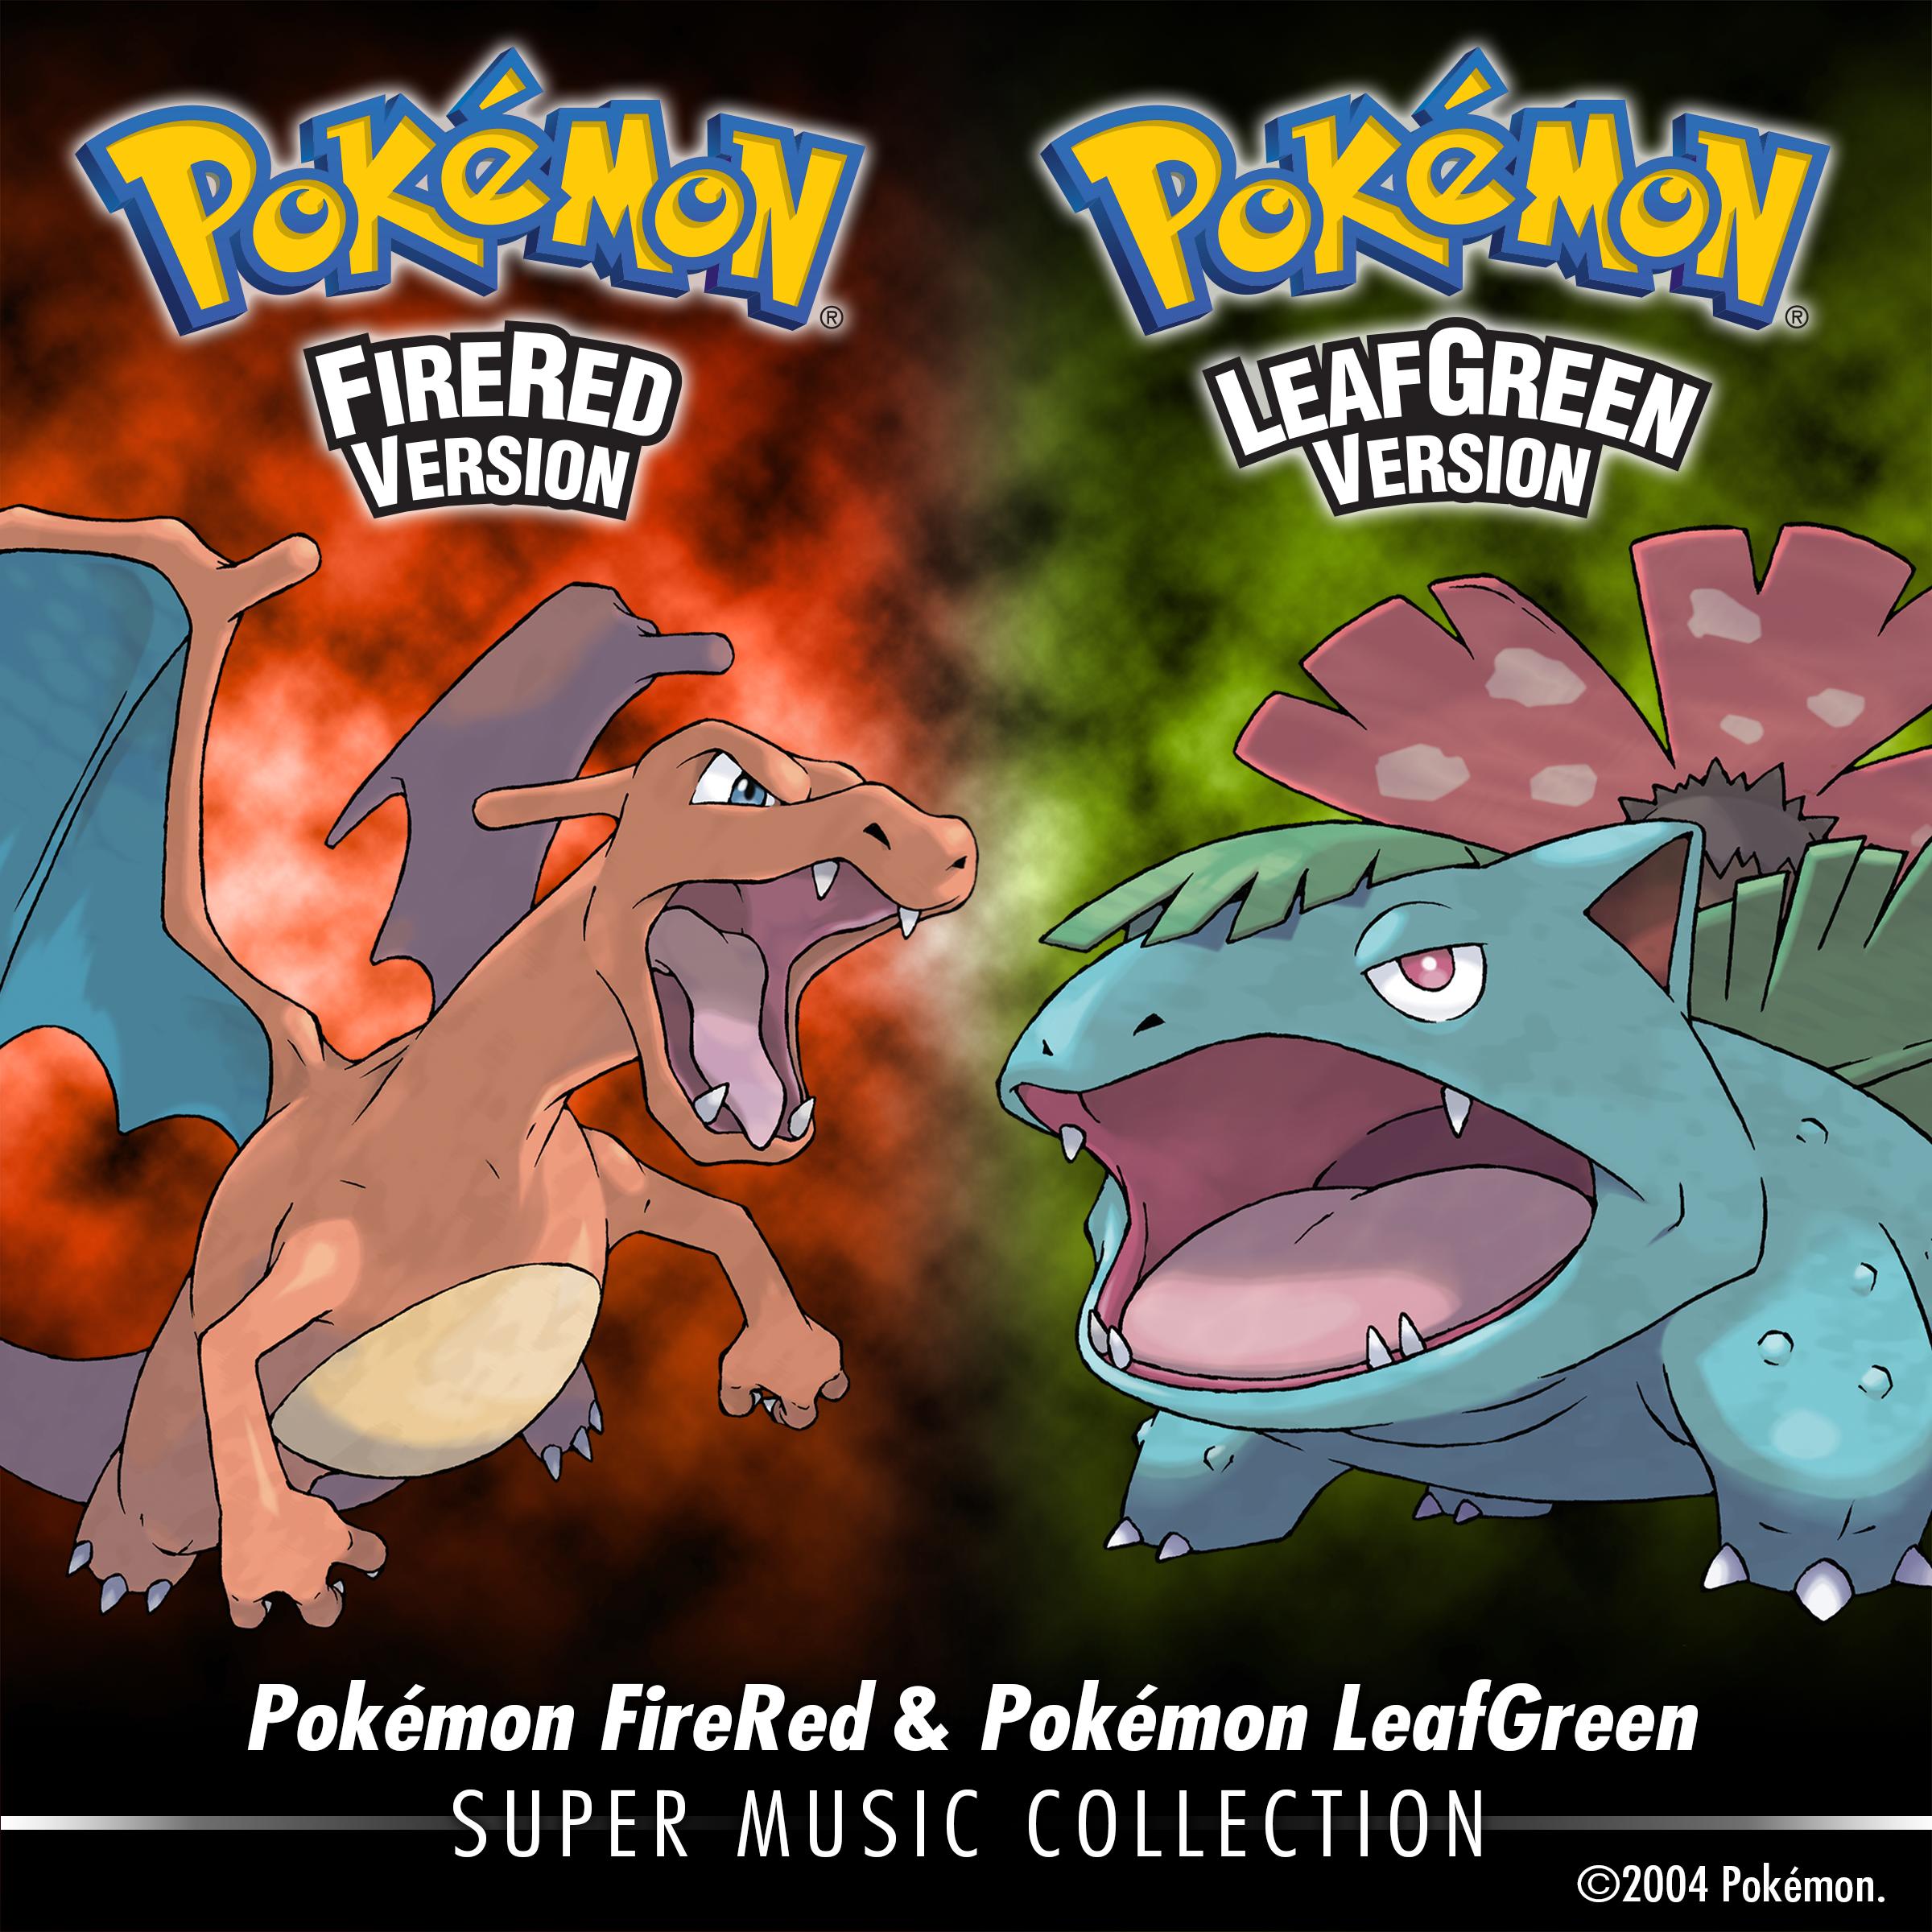 Pokémon FireRed and Pokémon LeafGreen Soundtrack Album Cover_2400px.png